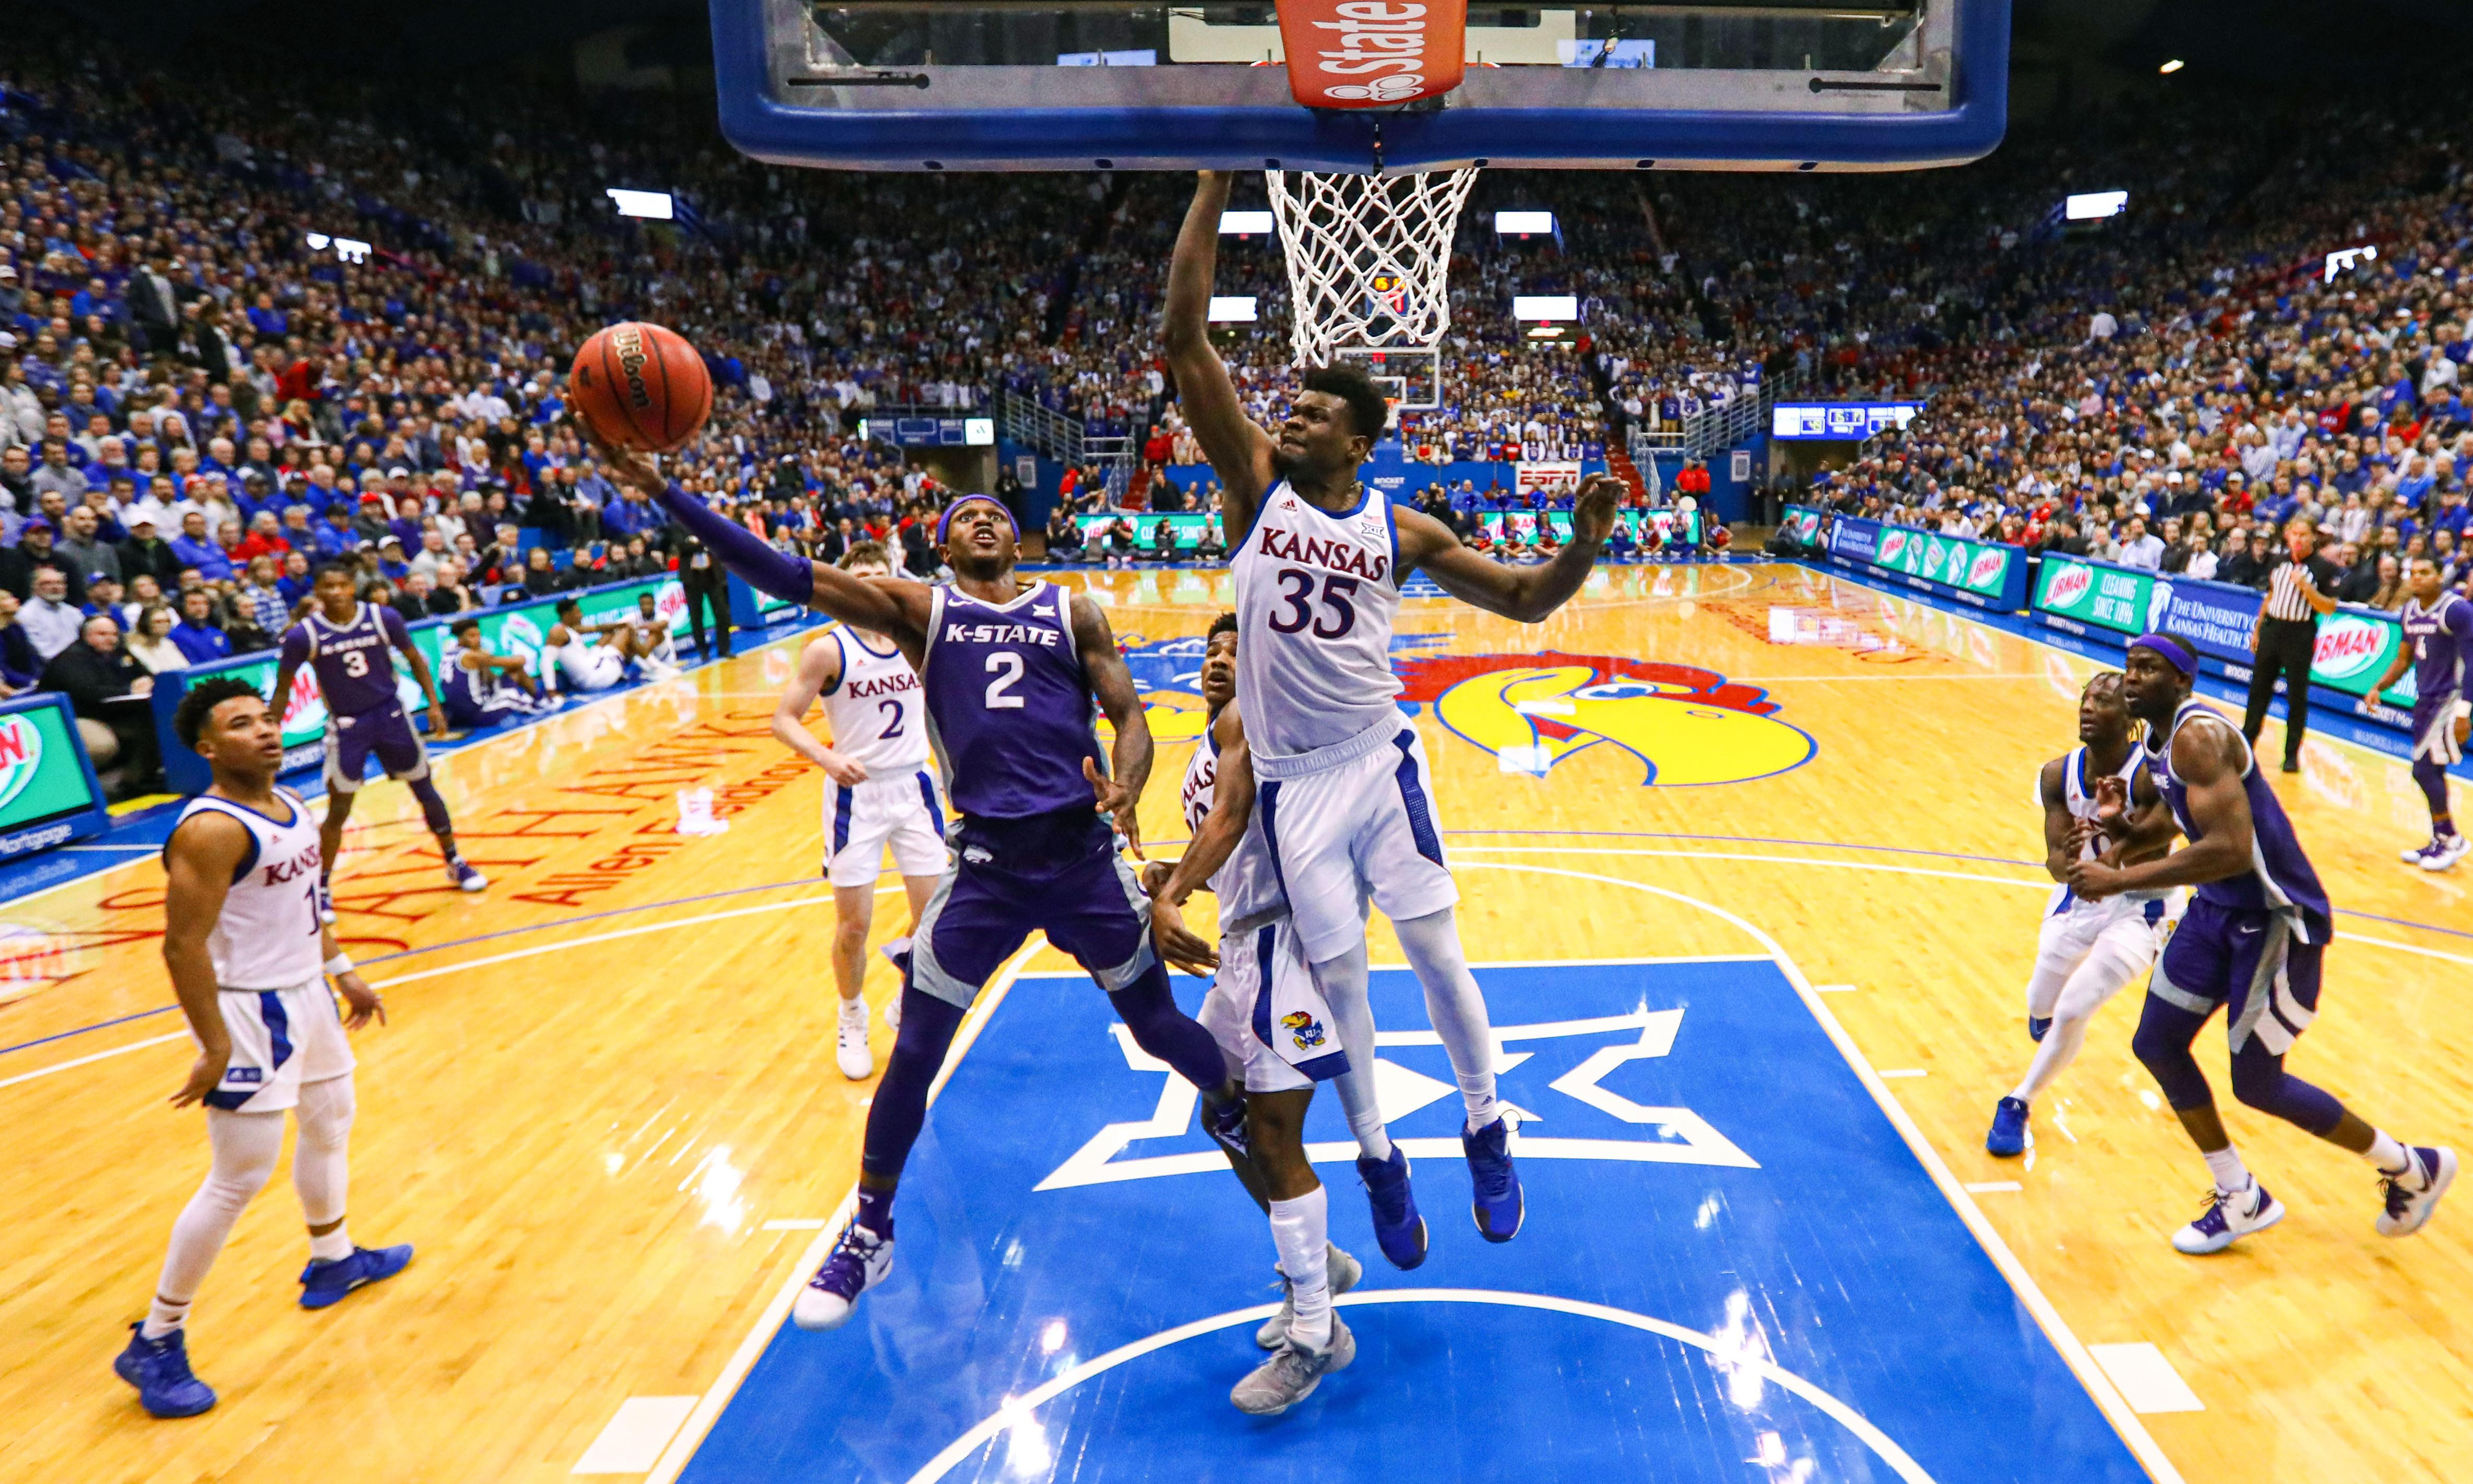 Kansas-Kansas State college basketball rivalry game ends in massive brawl